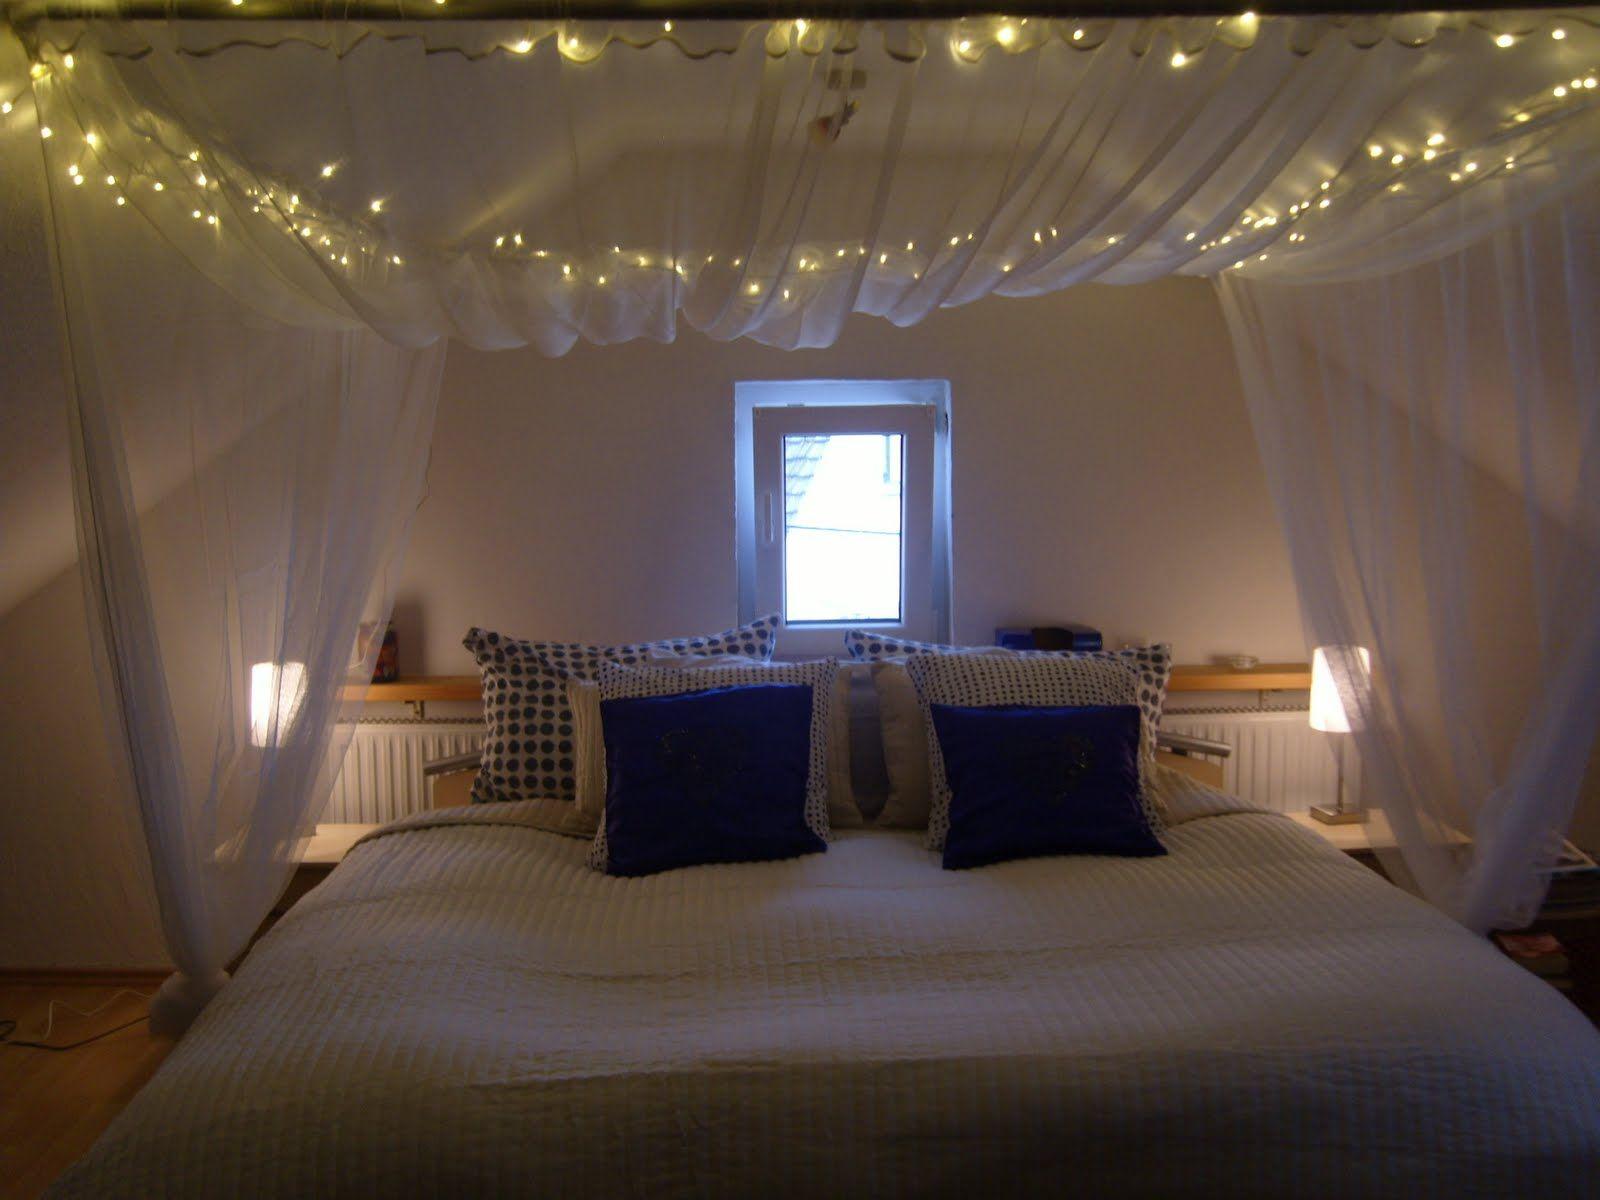 DIY Bed Canopy Ideas   Canopy Lights   Pinterest   Diy canopy ...